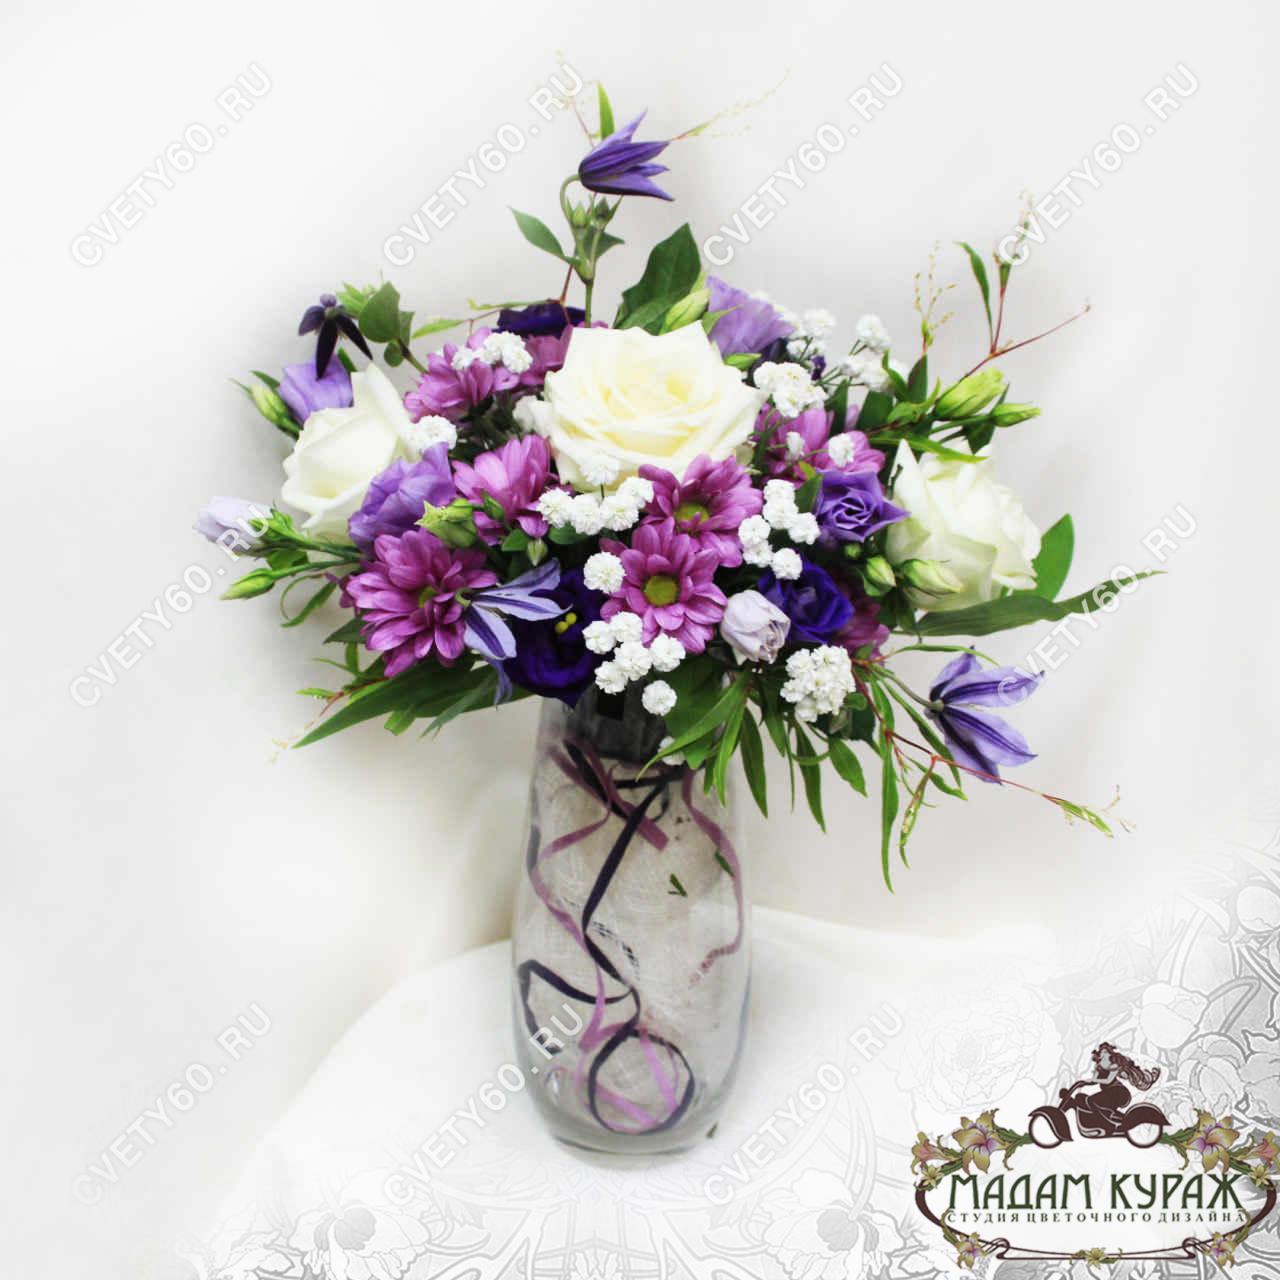 Мини-композиции из роз и хризантем